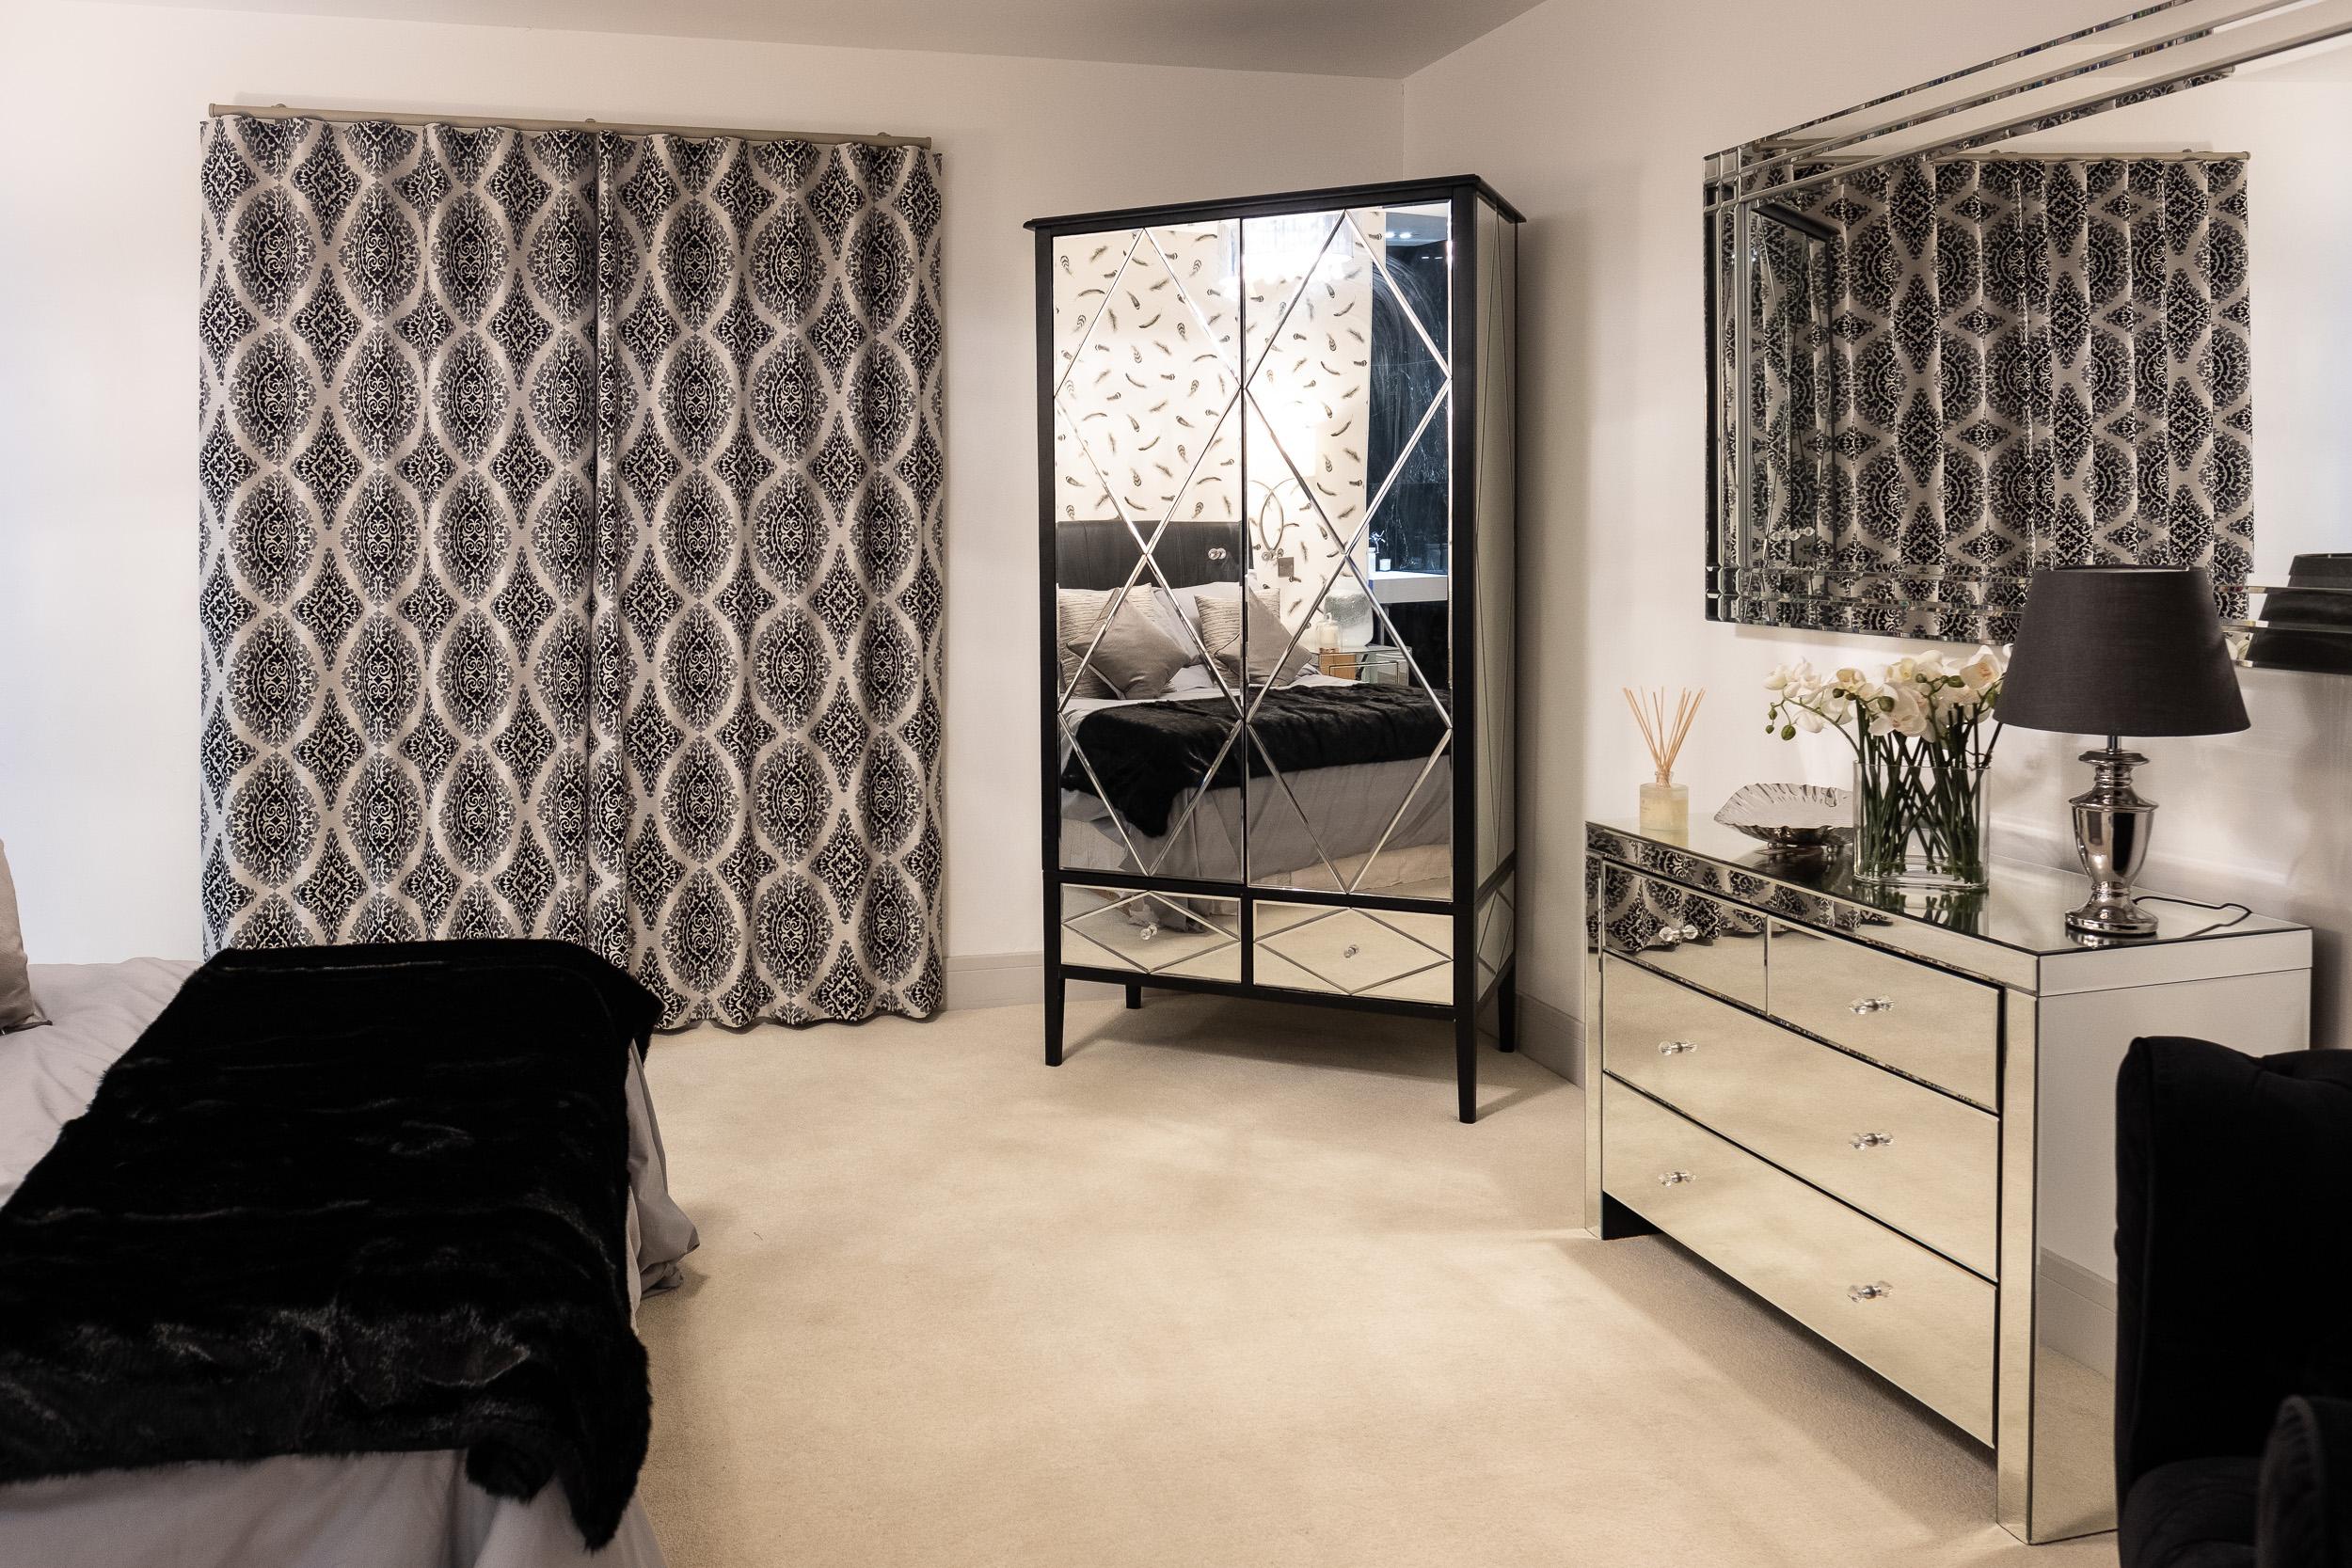 Interior-design-jason-holt-photography.jpg